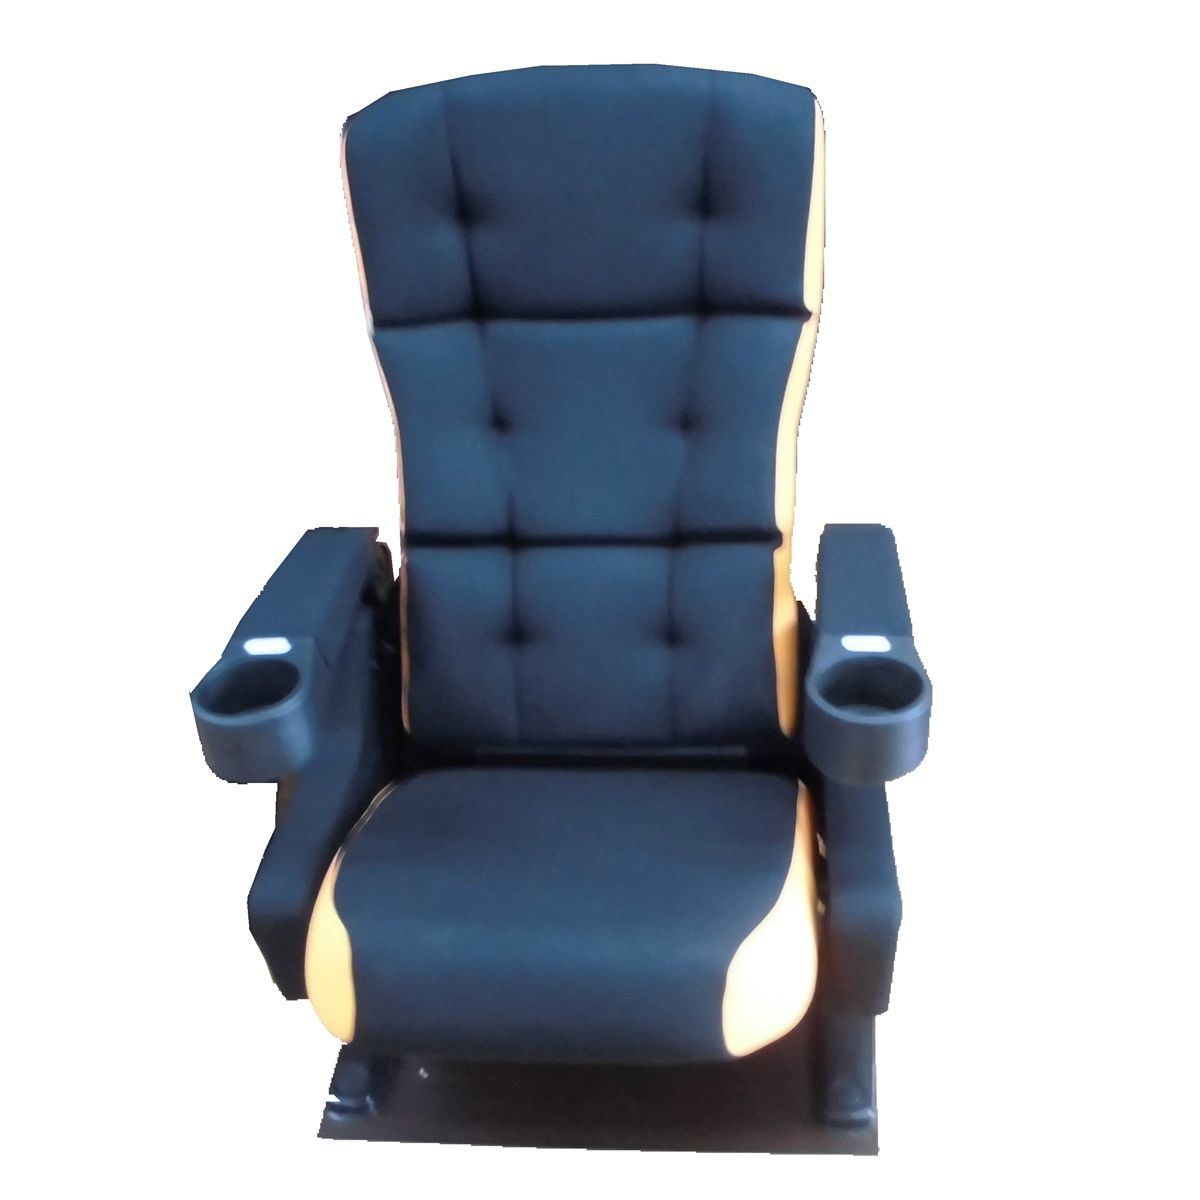 Cinema Seat Chair Theater Seating Auditorium Chair (EB03)